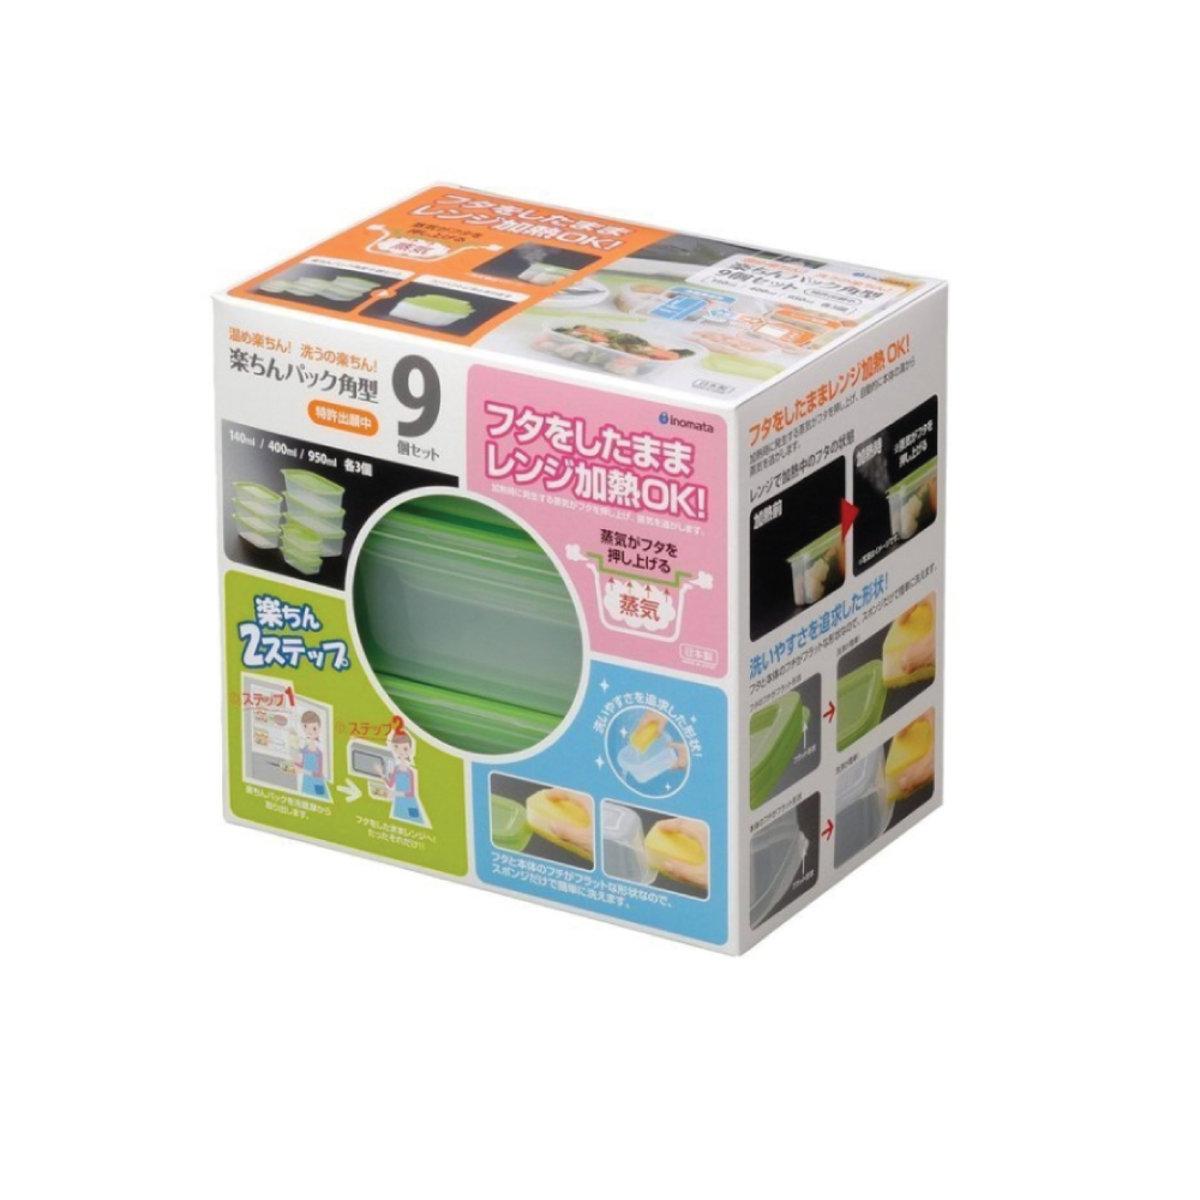 Microwave storage box (9 pieces) (Parallel Import)